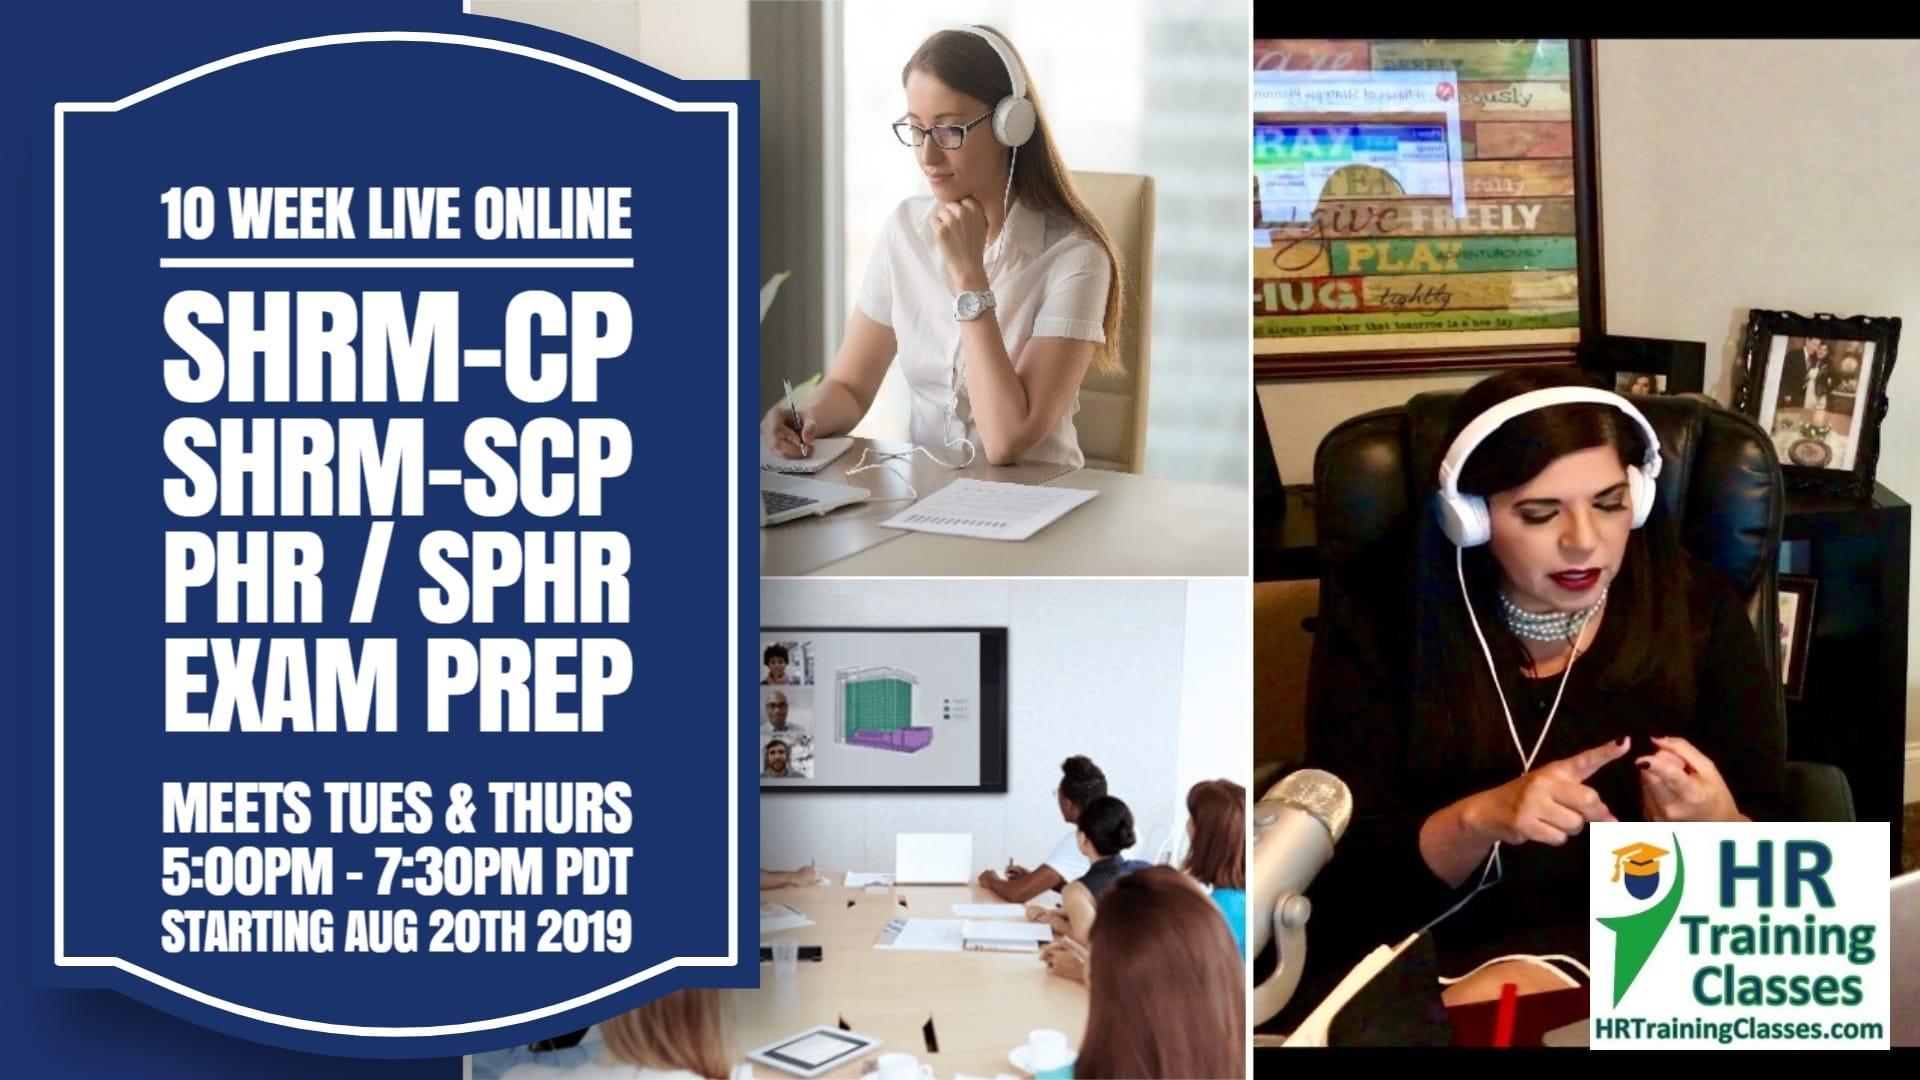 10 Week Live Online SHRM-CP, SHRM-SCP, PHR, SPHR Exam Prep starting 8-20-19 and led by Elga lejarza-Penn, aPHR, PHR, SPHR, SHRM-CP, SHRM-SCP